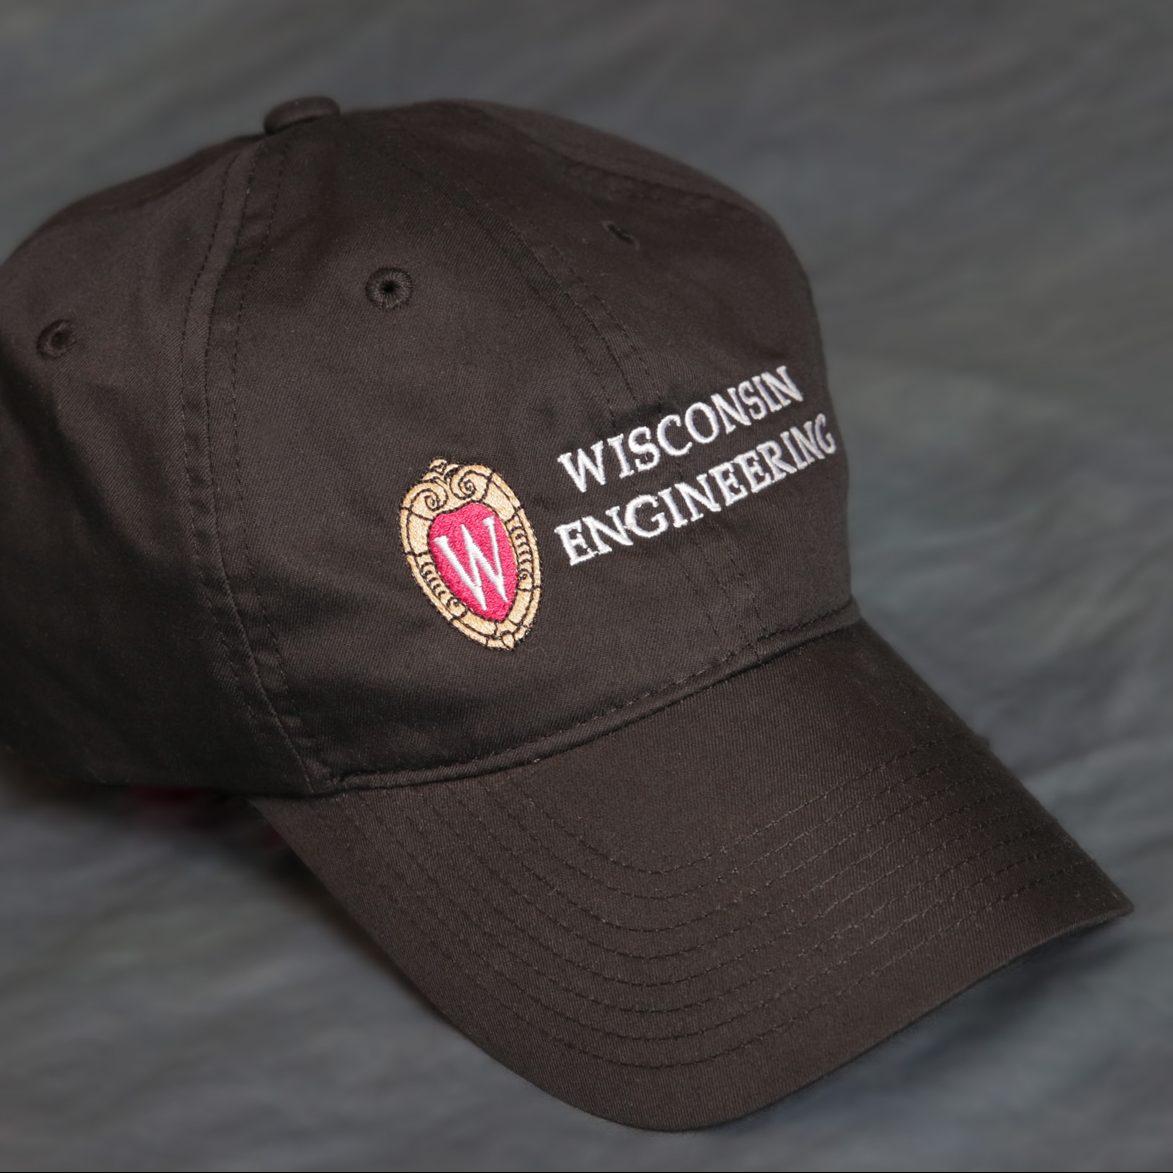 College of Engineering cap in black